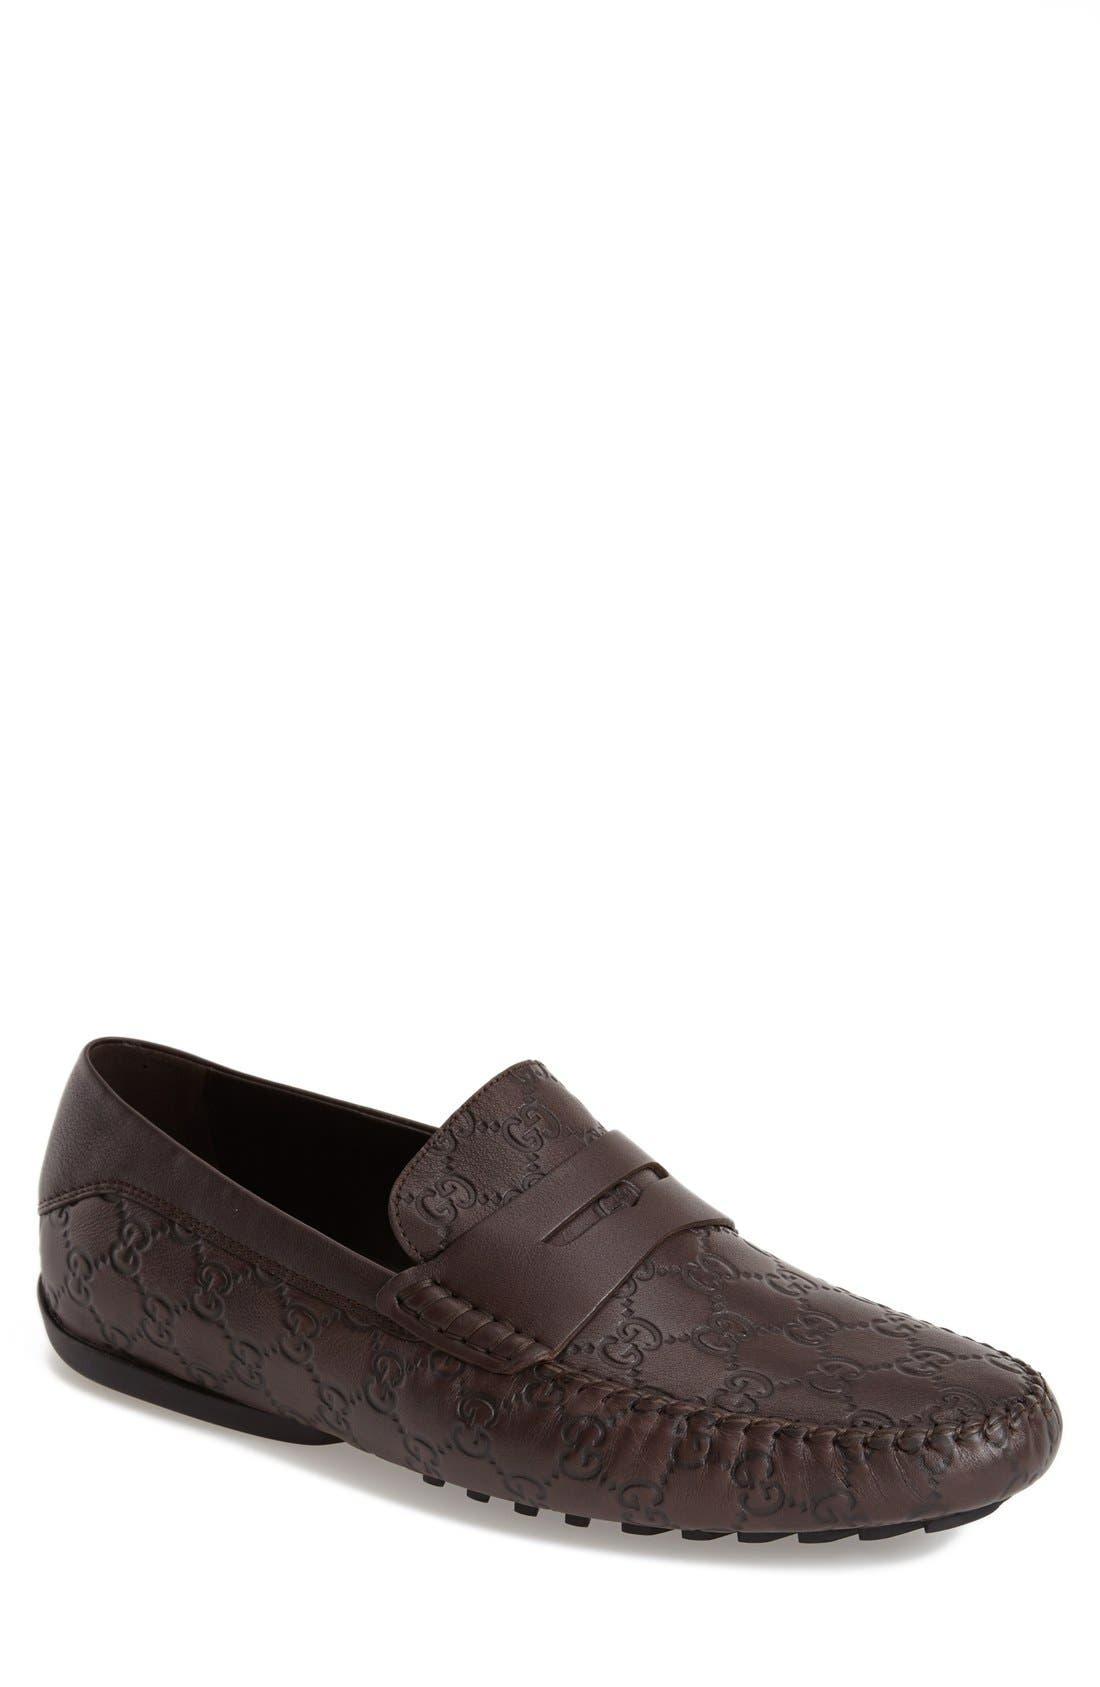 San Marino Driving Shoe,                         Main,                         color, Dark Chocolate